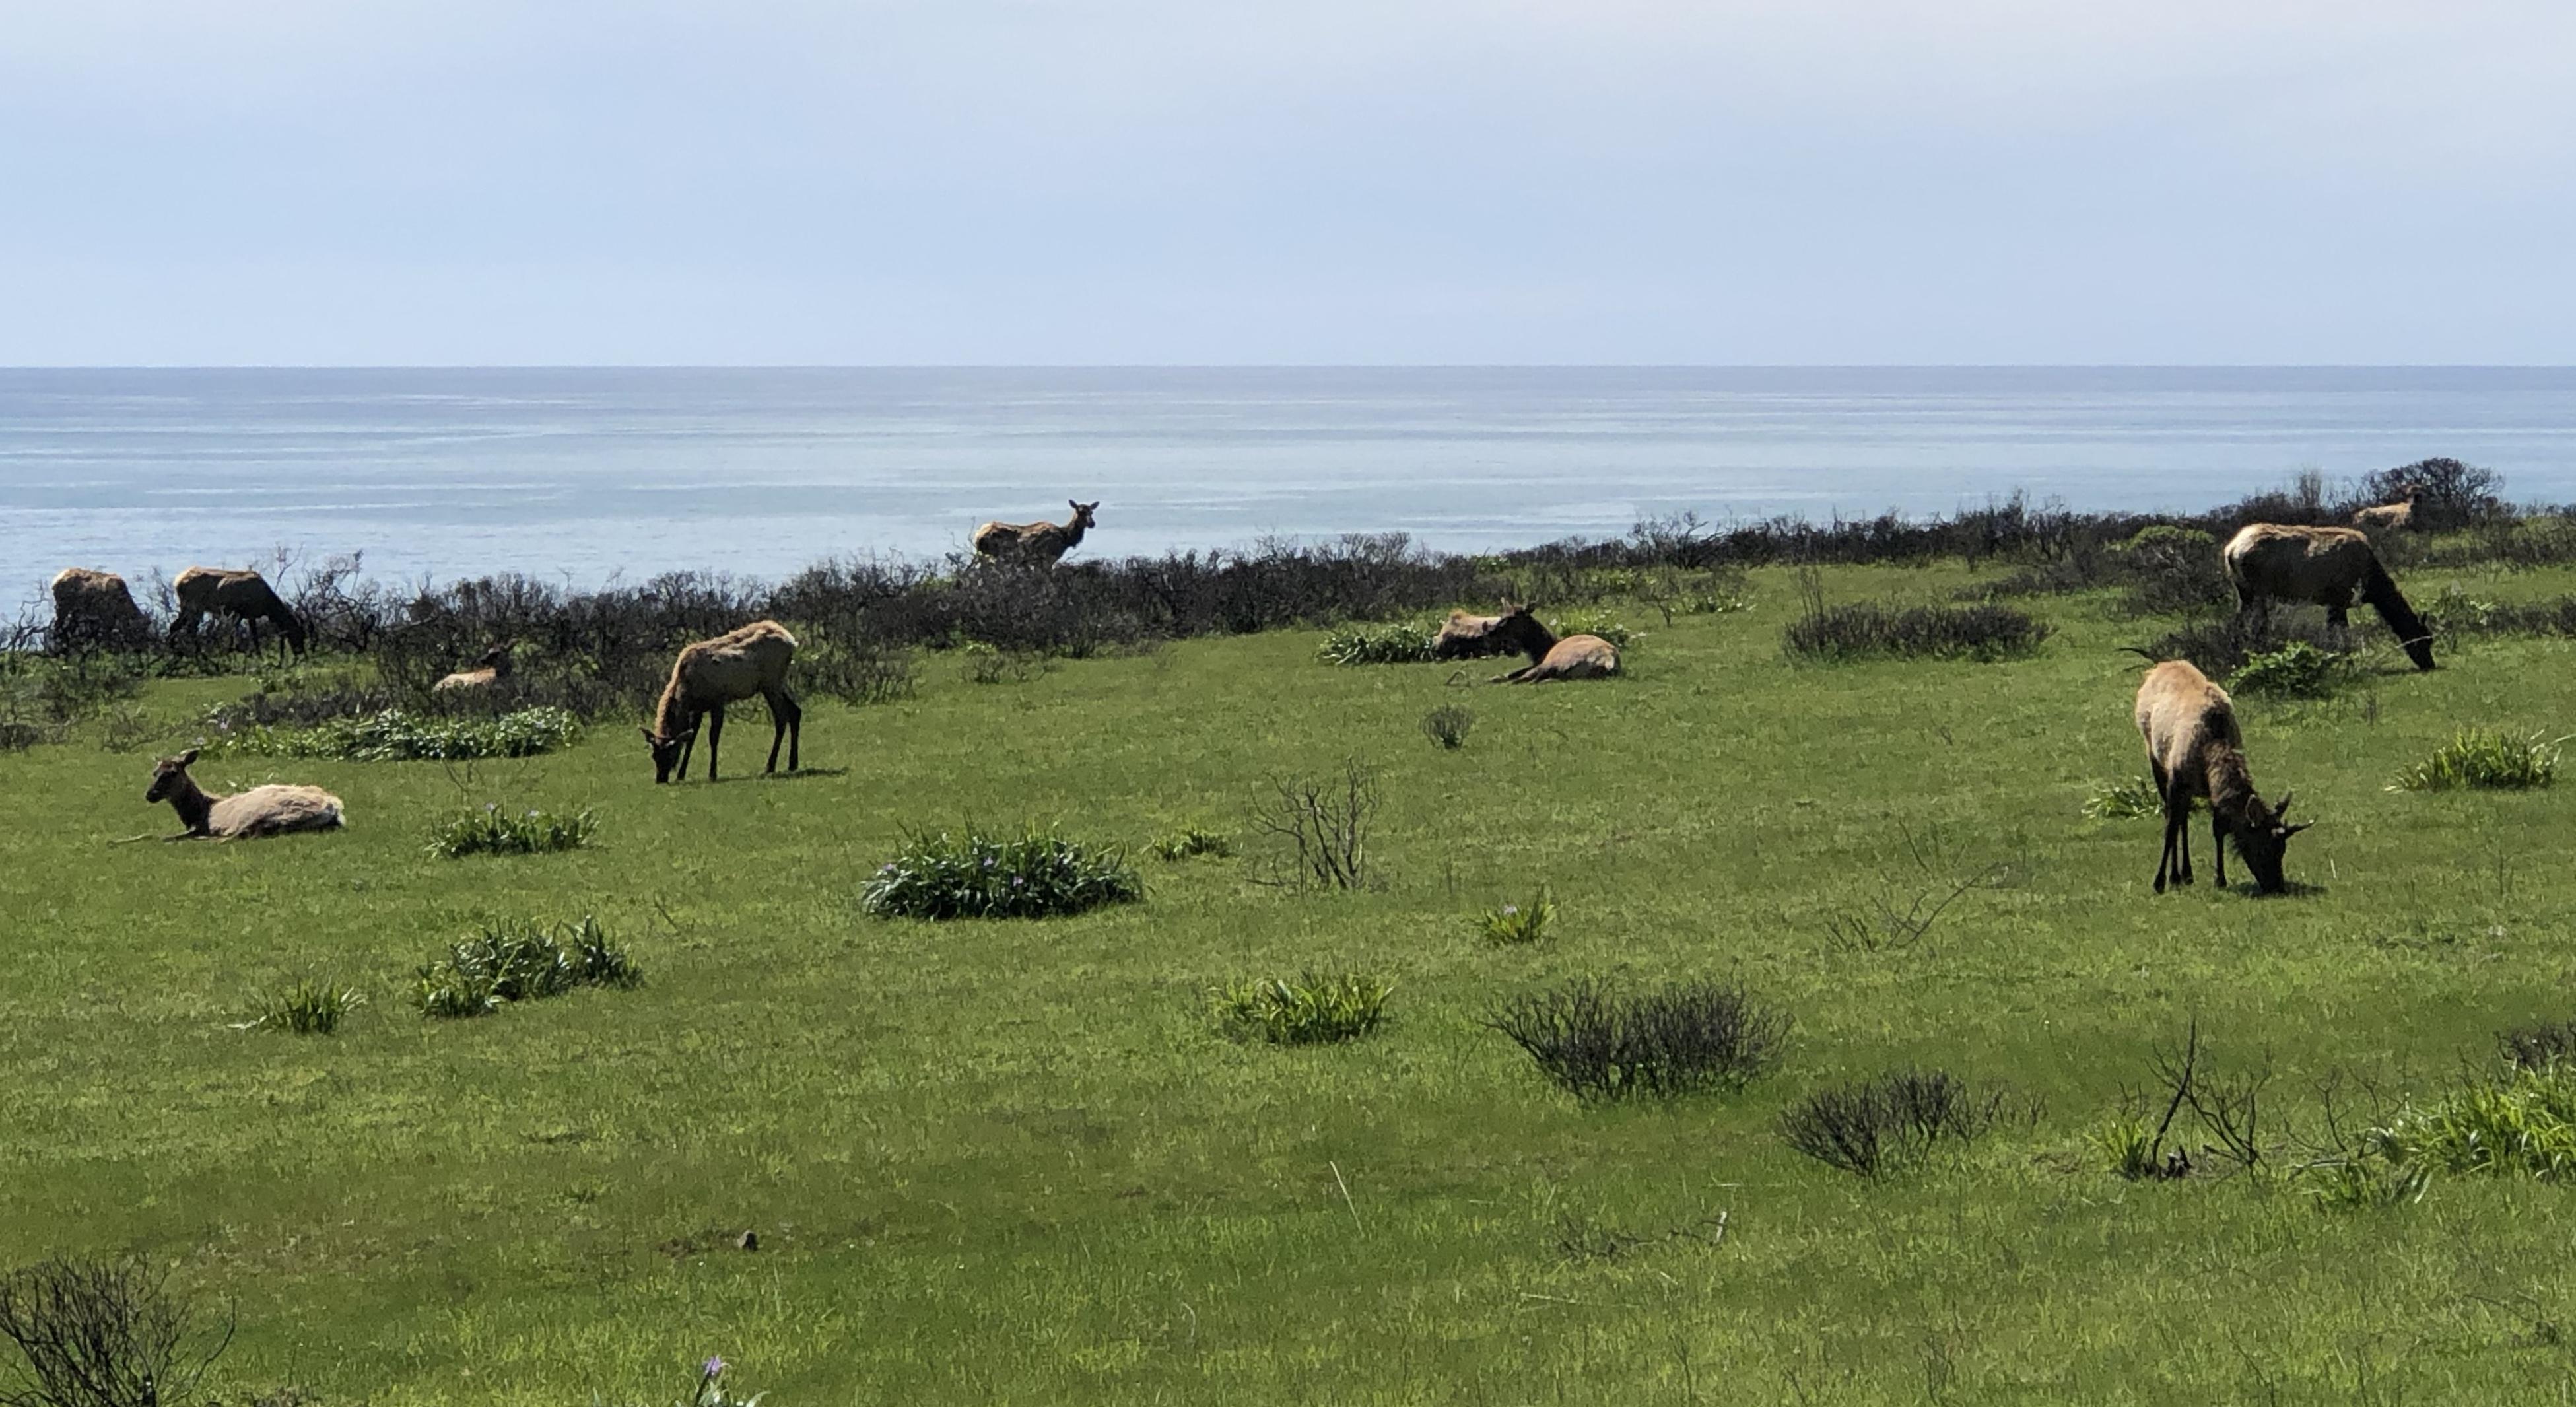 Elk in the Sinkyone